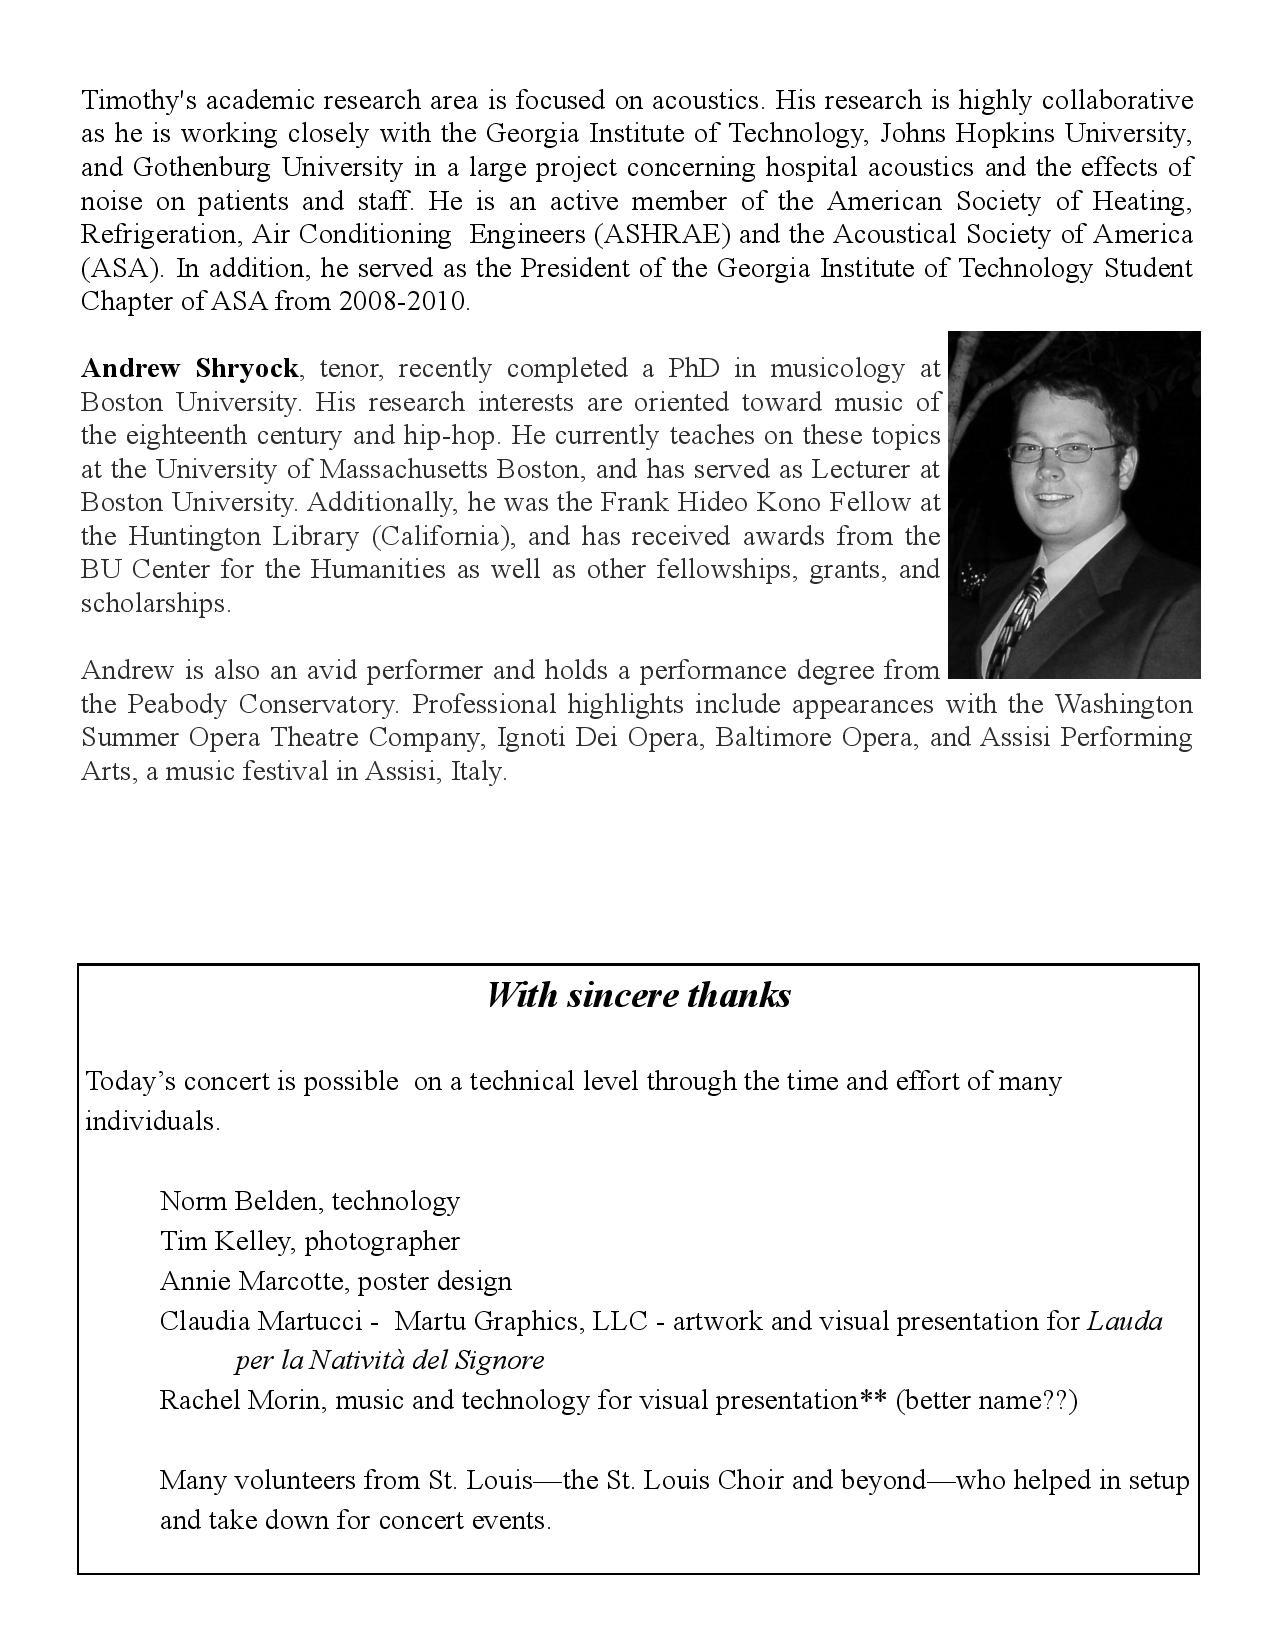 2012-12-16 Program Draft - 2012-12-11 v2-page-013.jpg